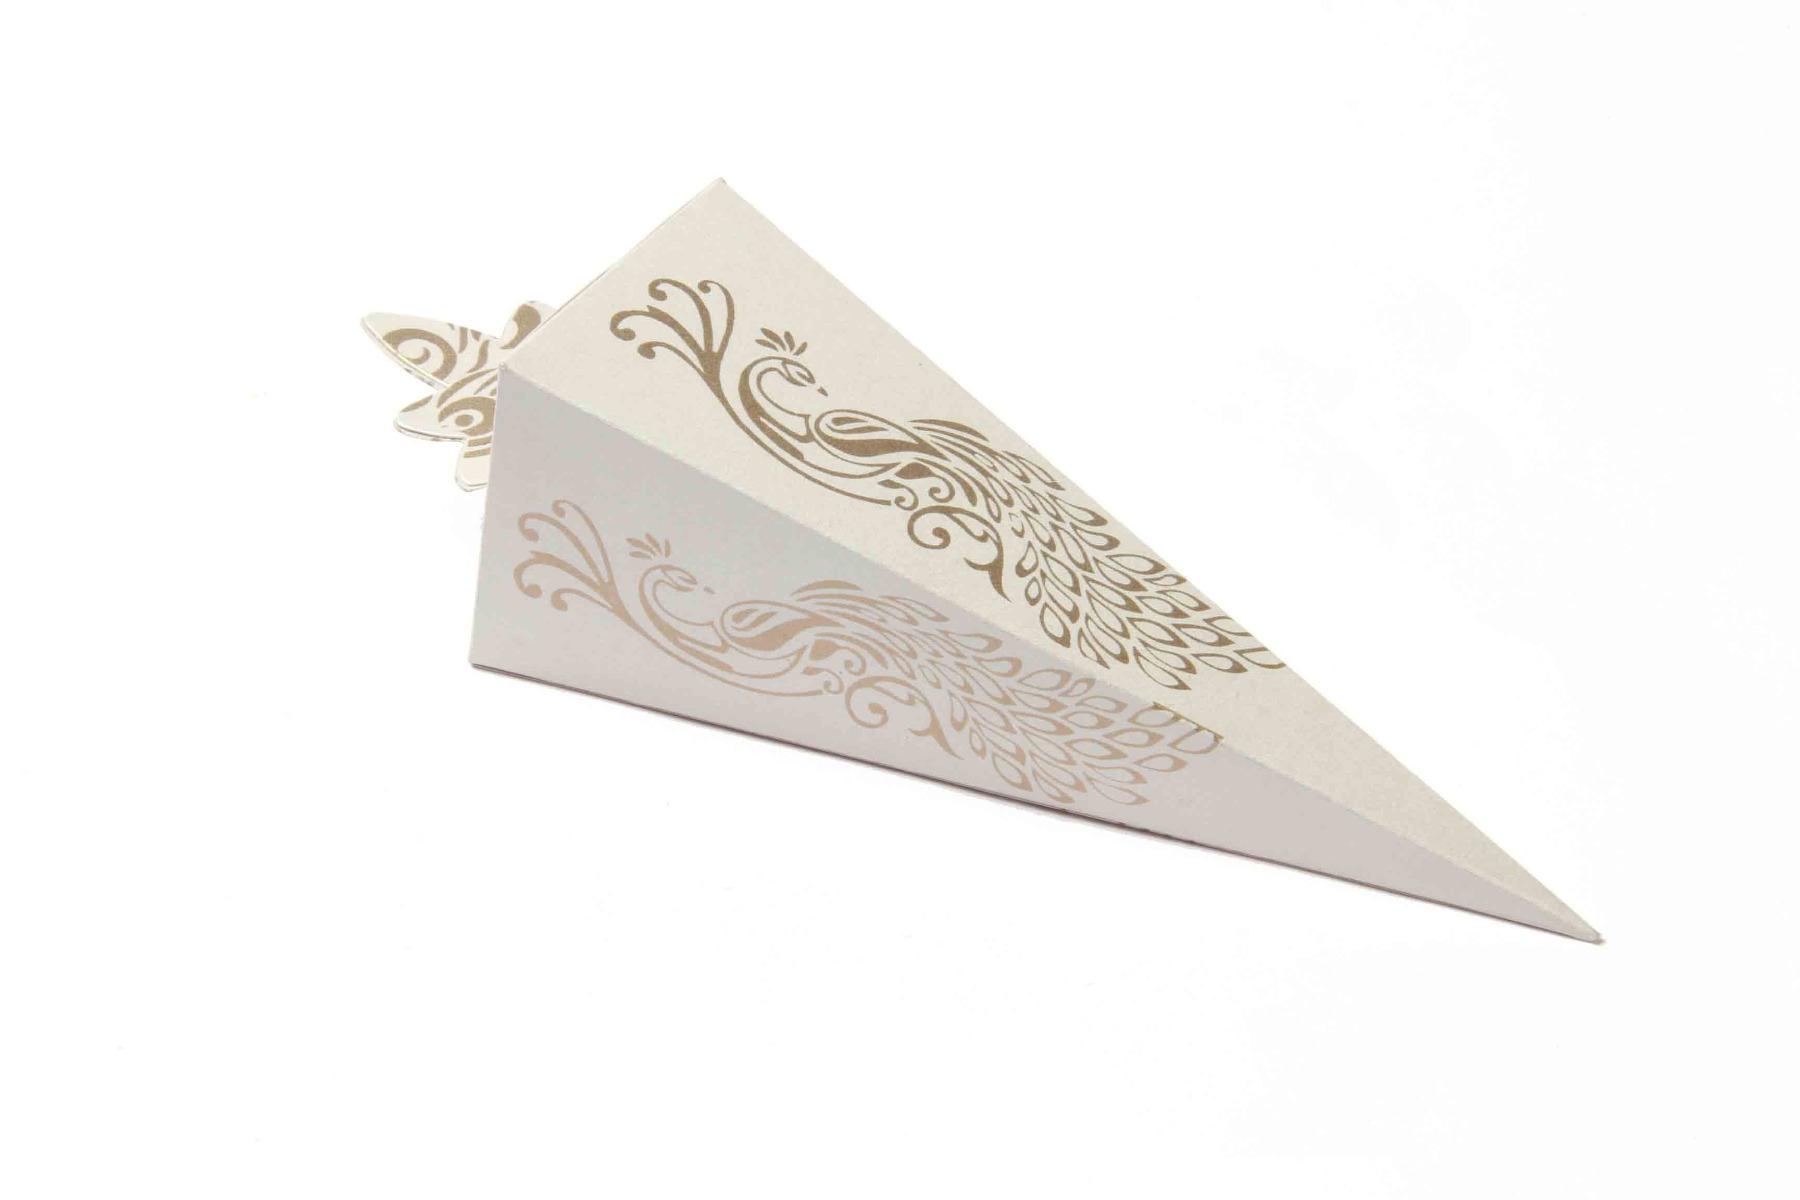 Cone Shaped Favor Box No 8 - White-0